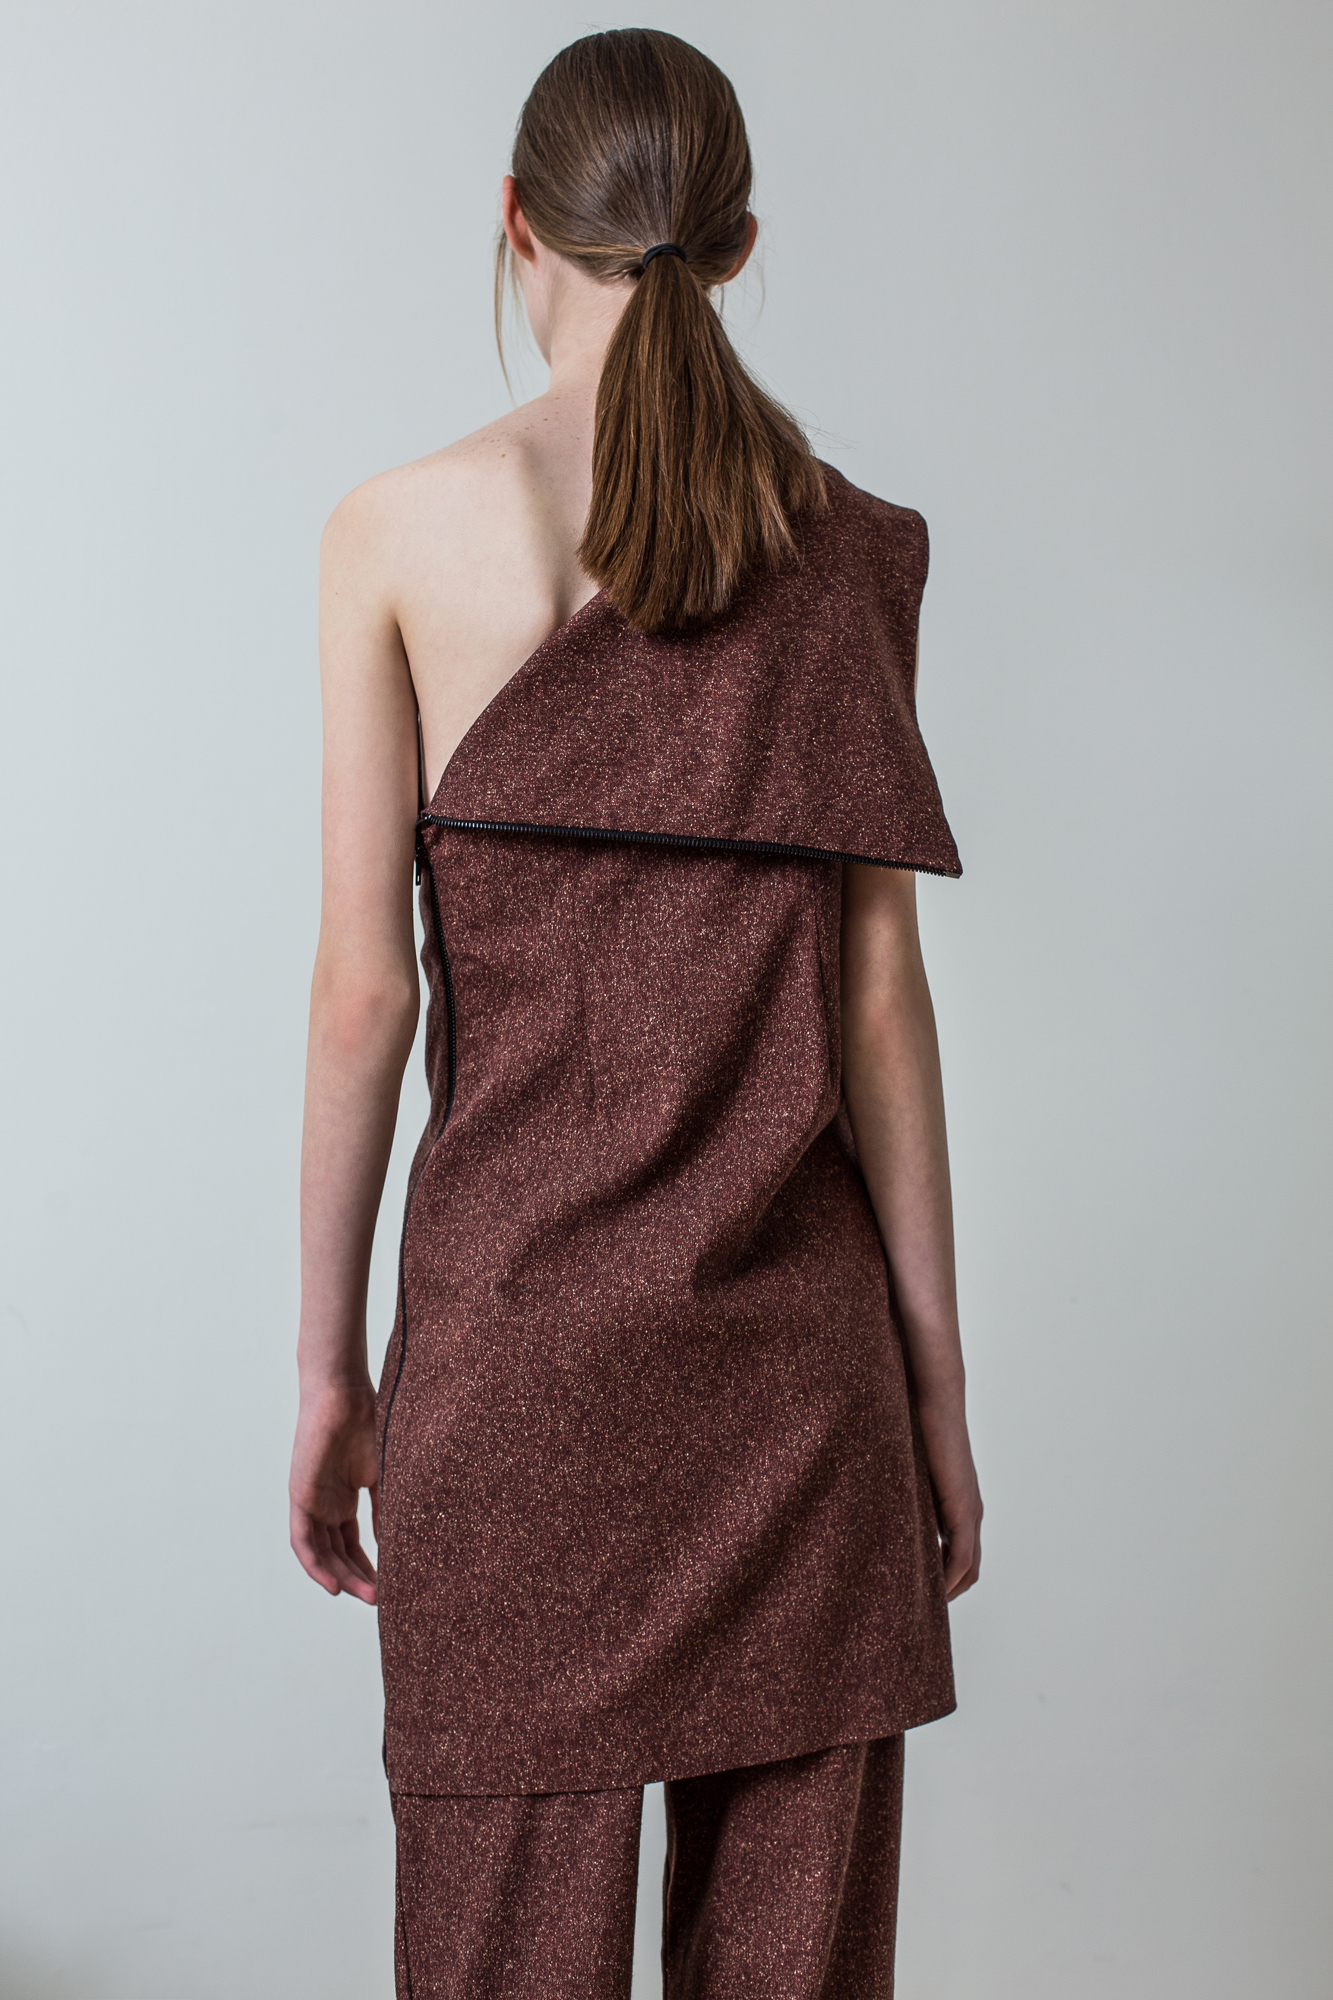 wearenotsisters_wrns_echo-dress_07